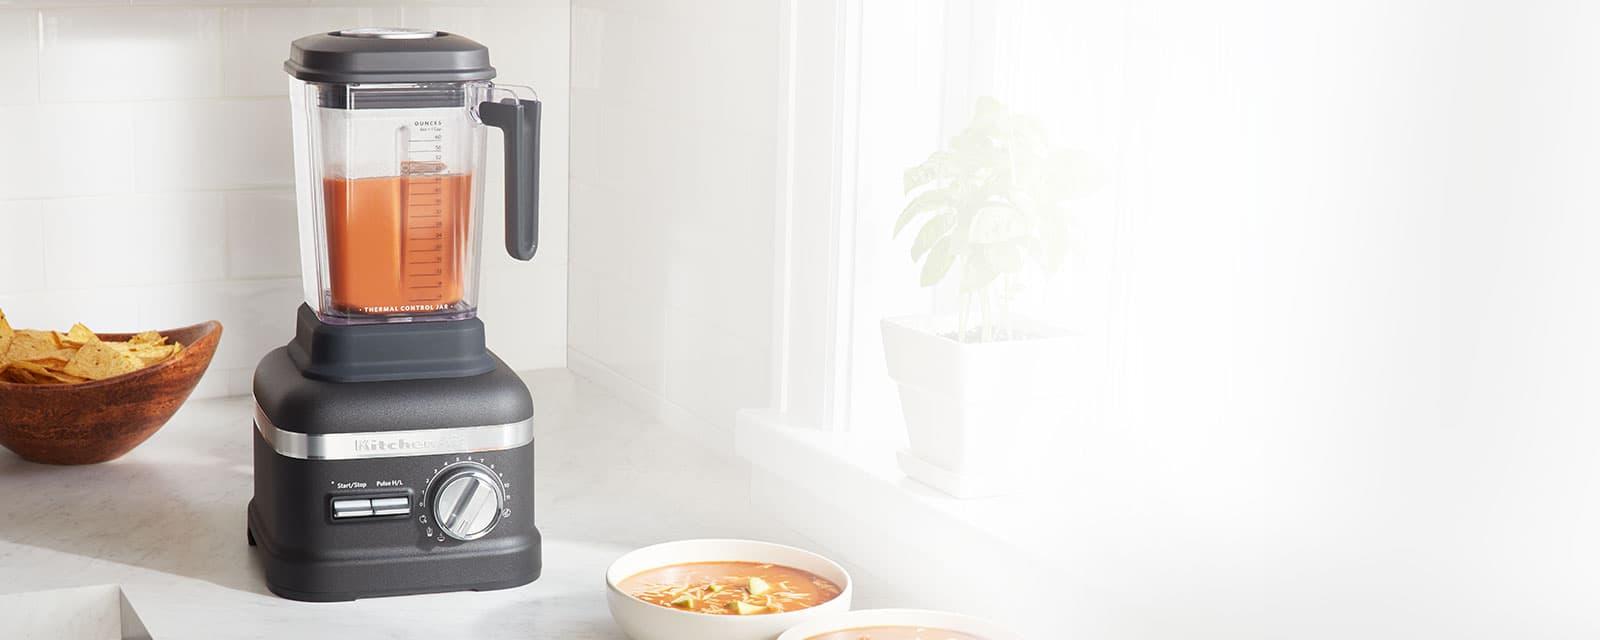 blender offizielle website von kitchenaid. Black Bedroom Furniture Sets. Home Design Ideas